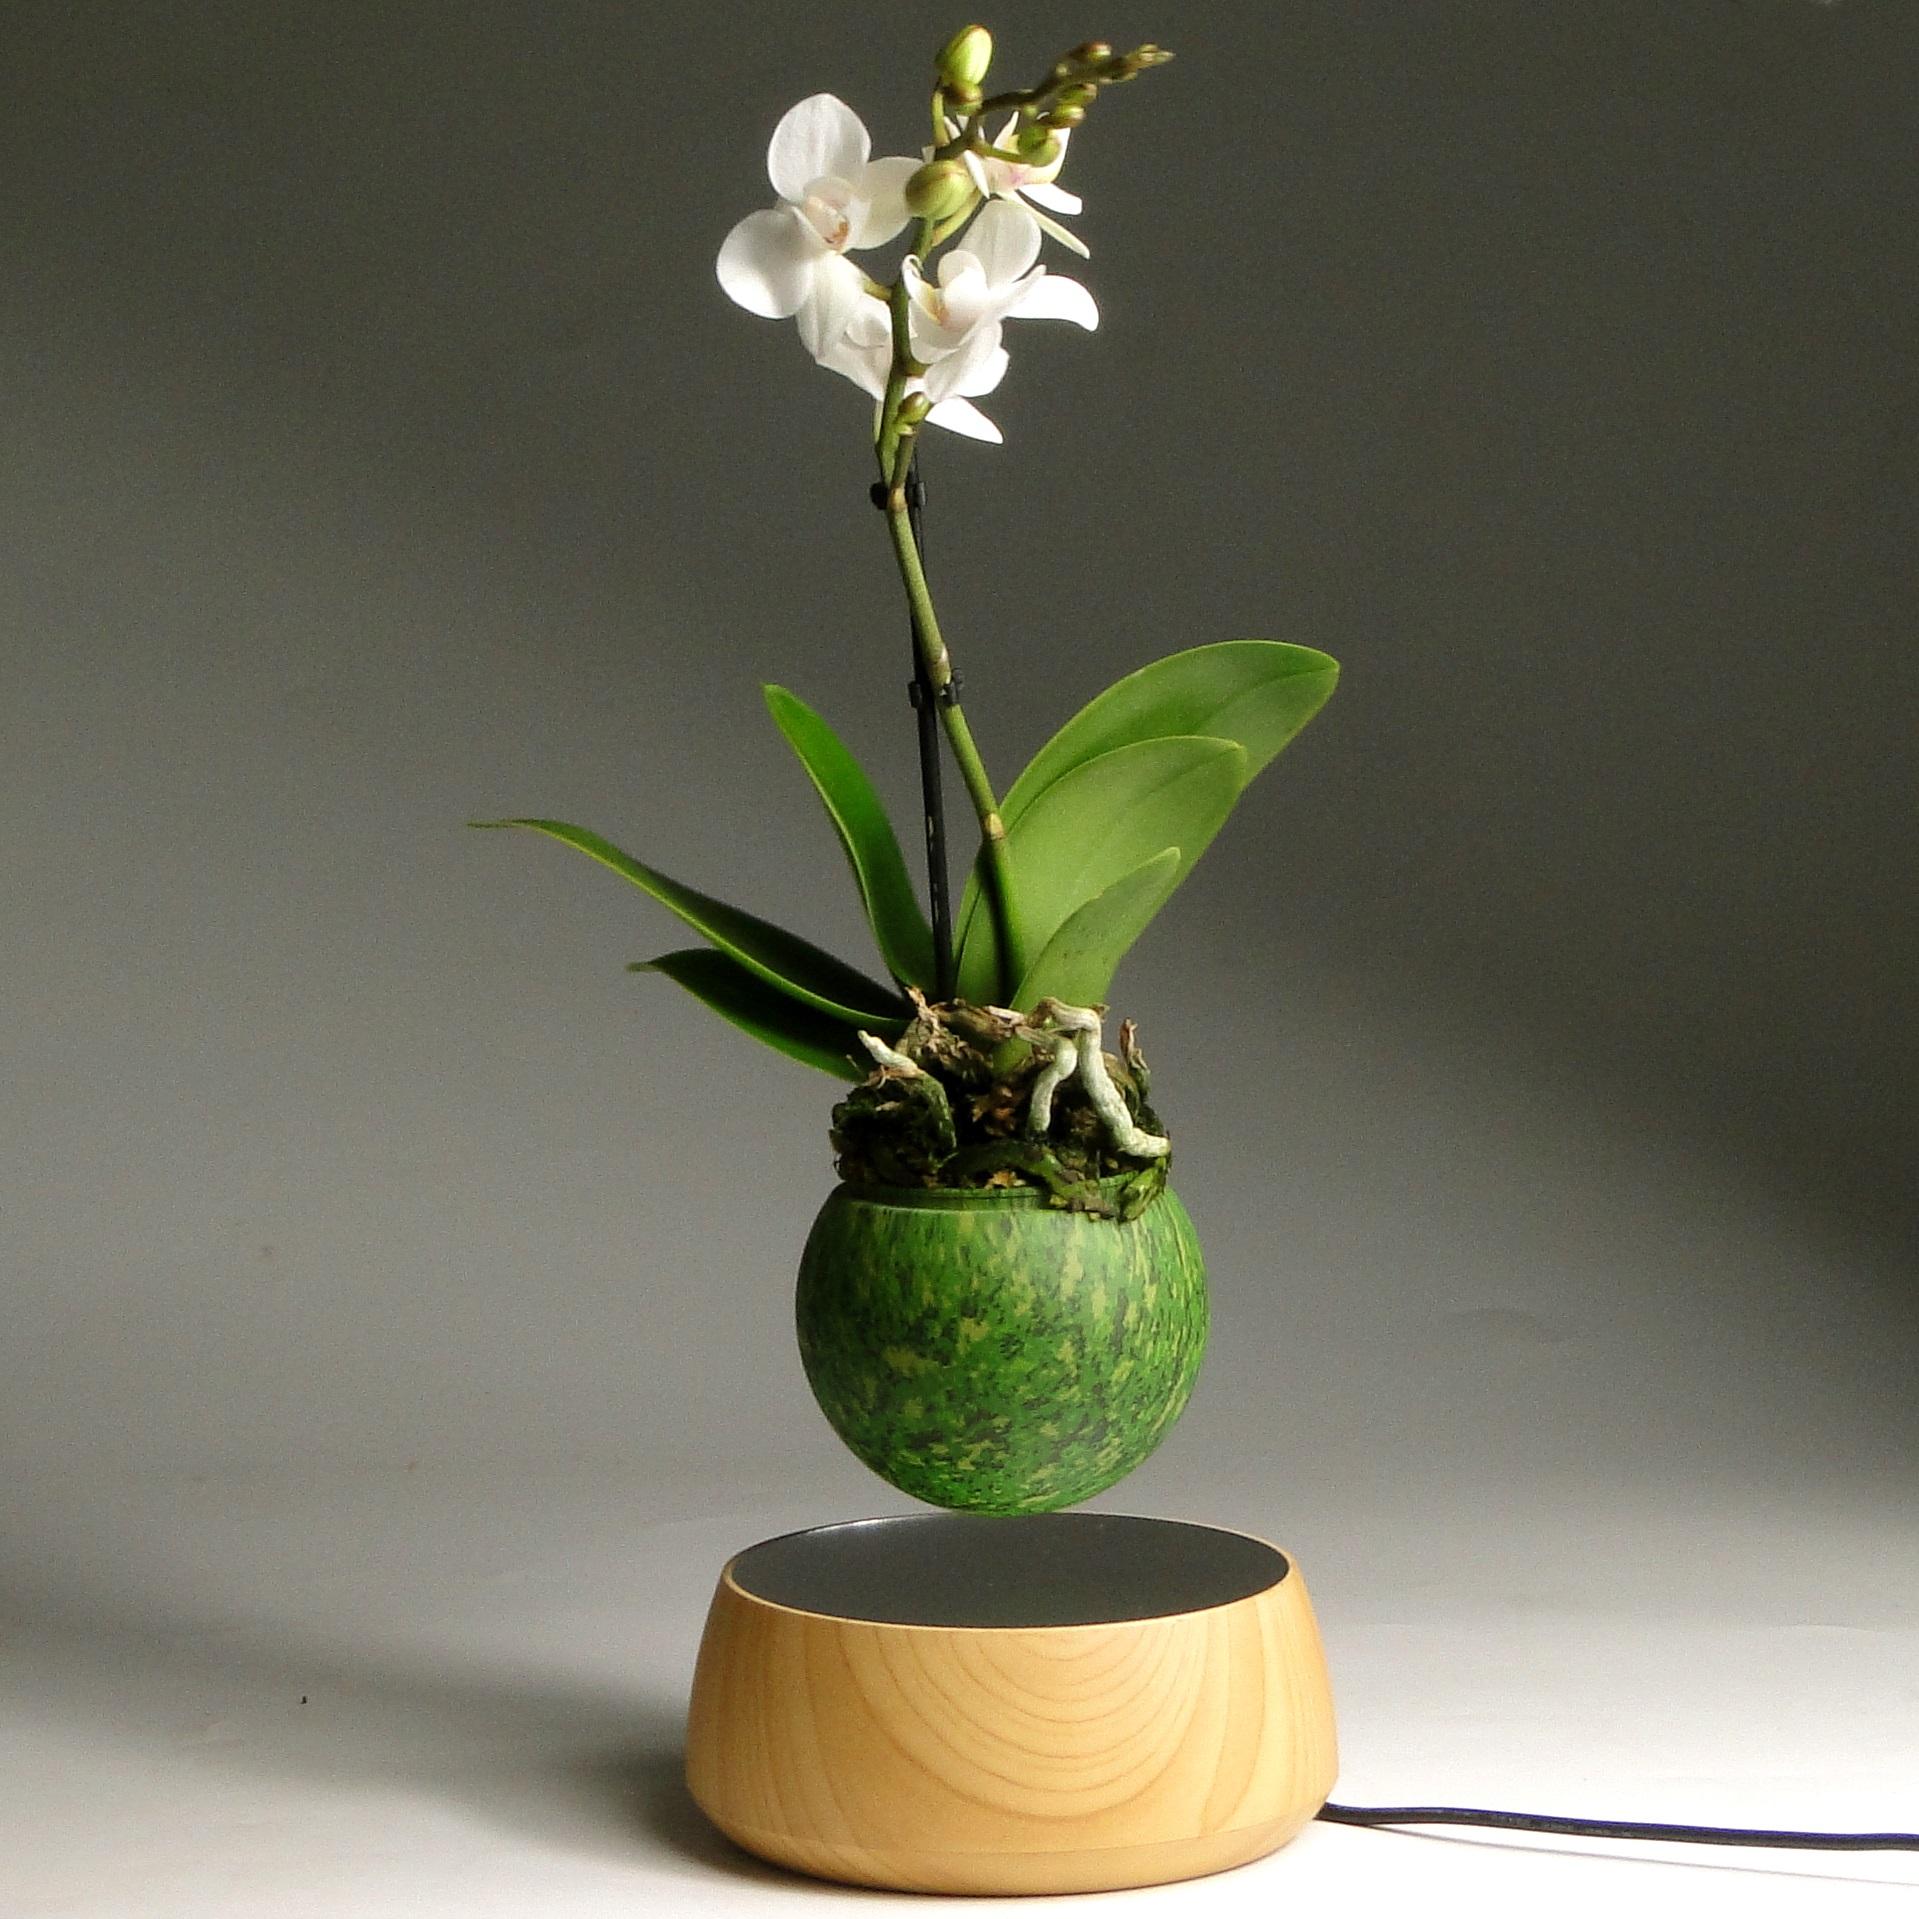 Левитирующая мини орхидея